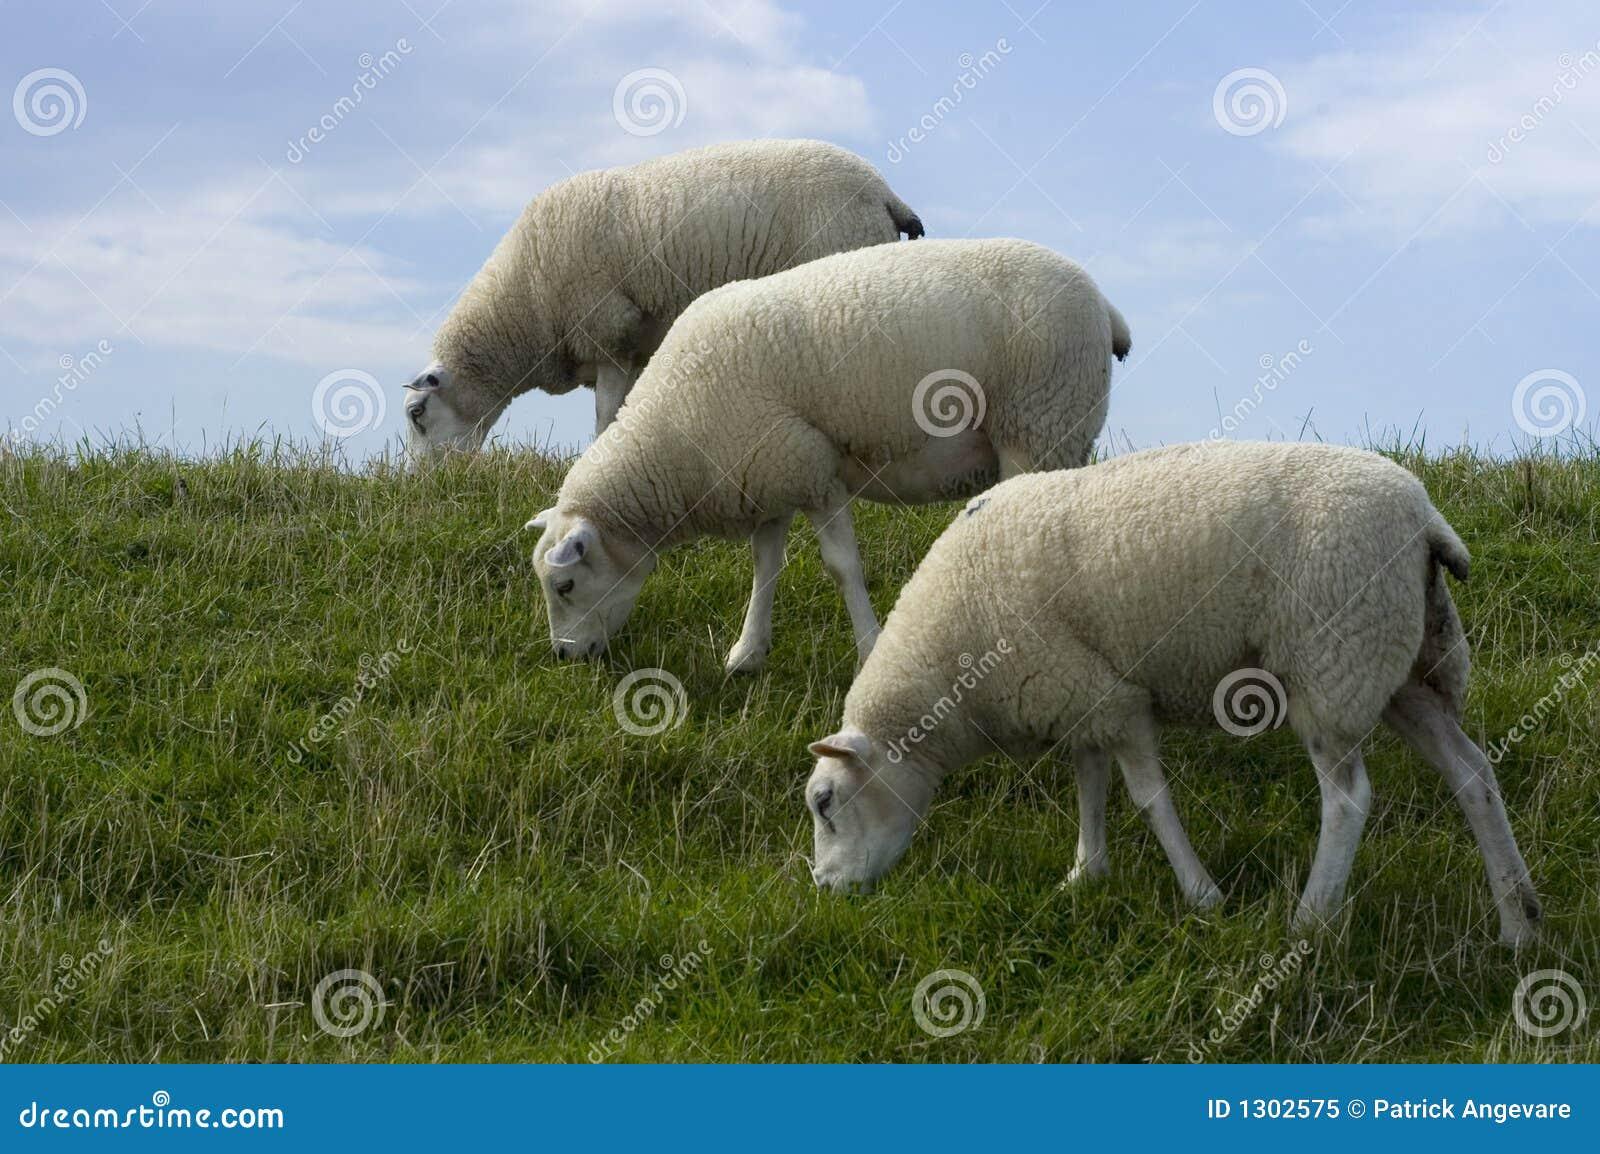 Three sheep - photo#21